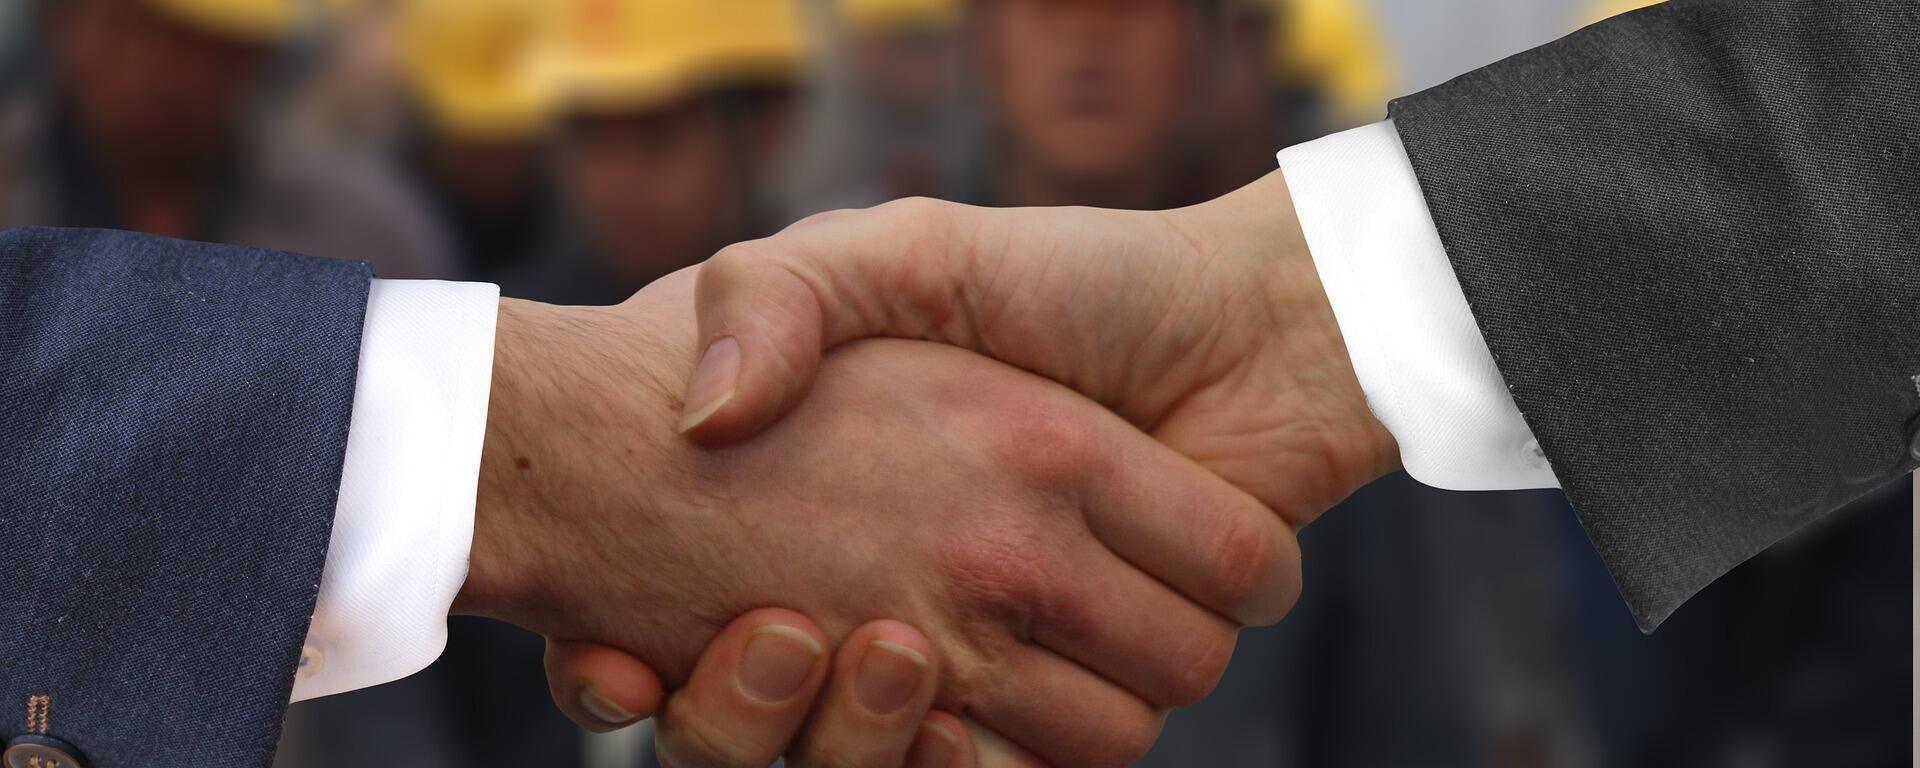 Dos hombres dándose las manos - Sputnik Mundo, 1920, 28.09.2021